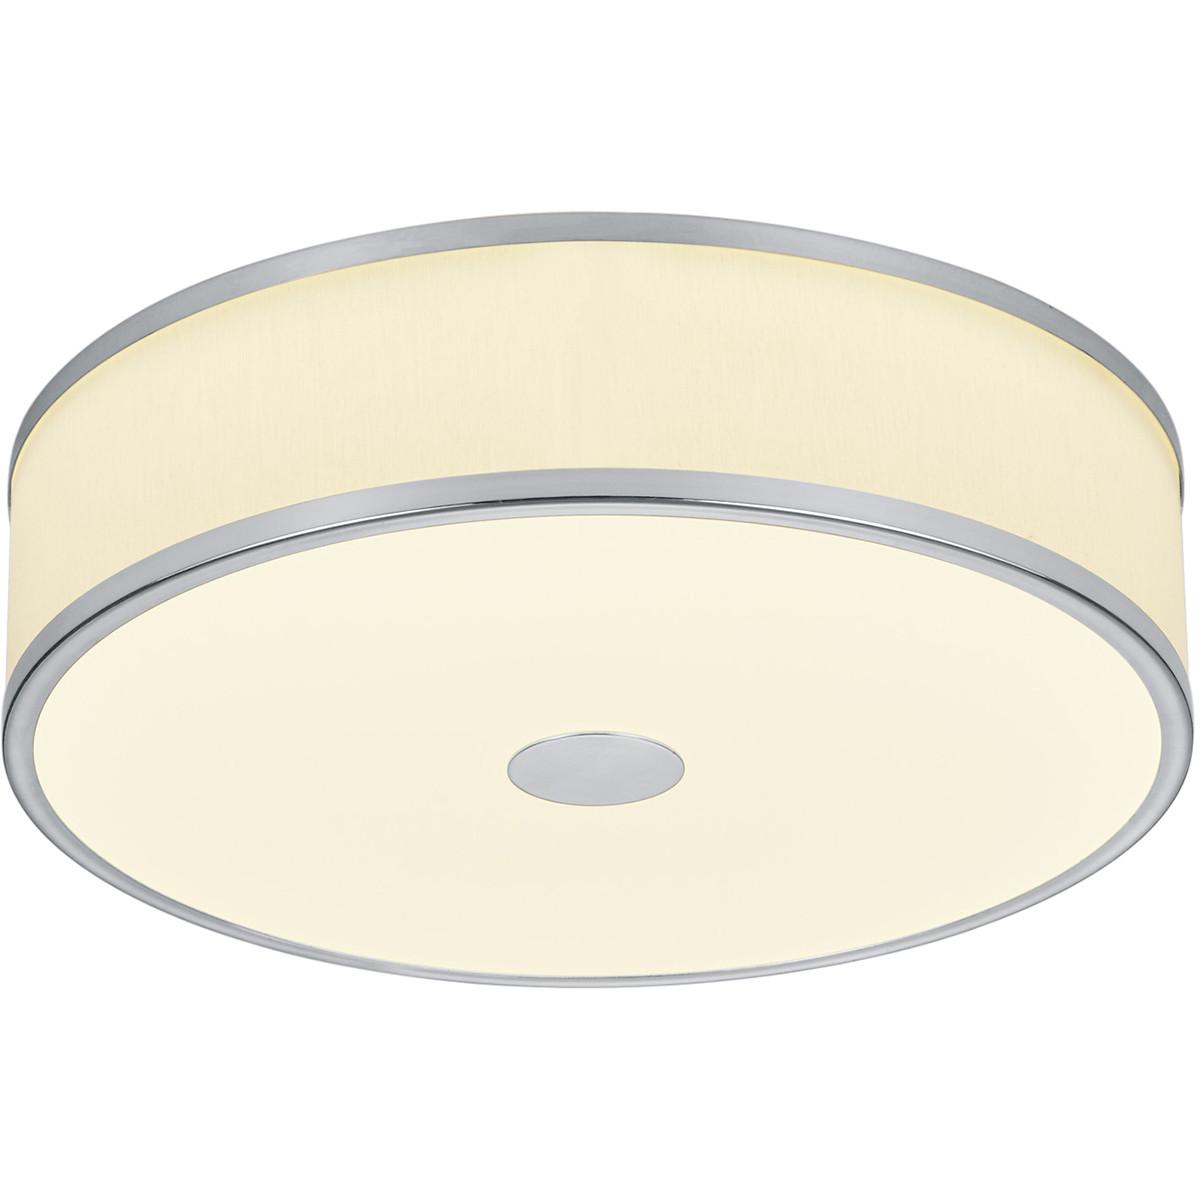 LED Plafondlamp - Trion Agiany - Opbouw Rond - 24W - Dimbaar - Warm Wit 3000K - Mat Nikkel - Alumini